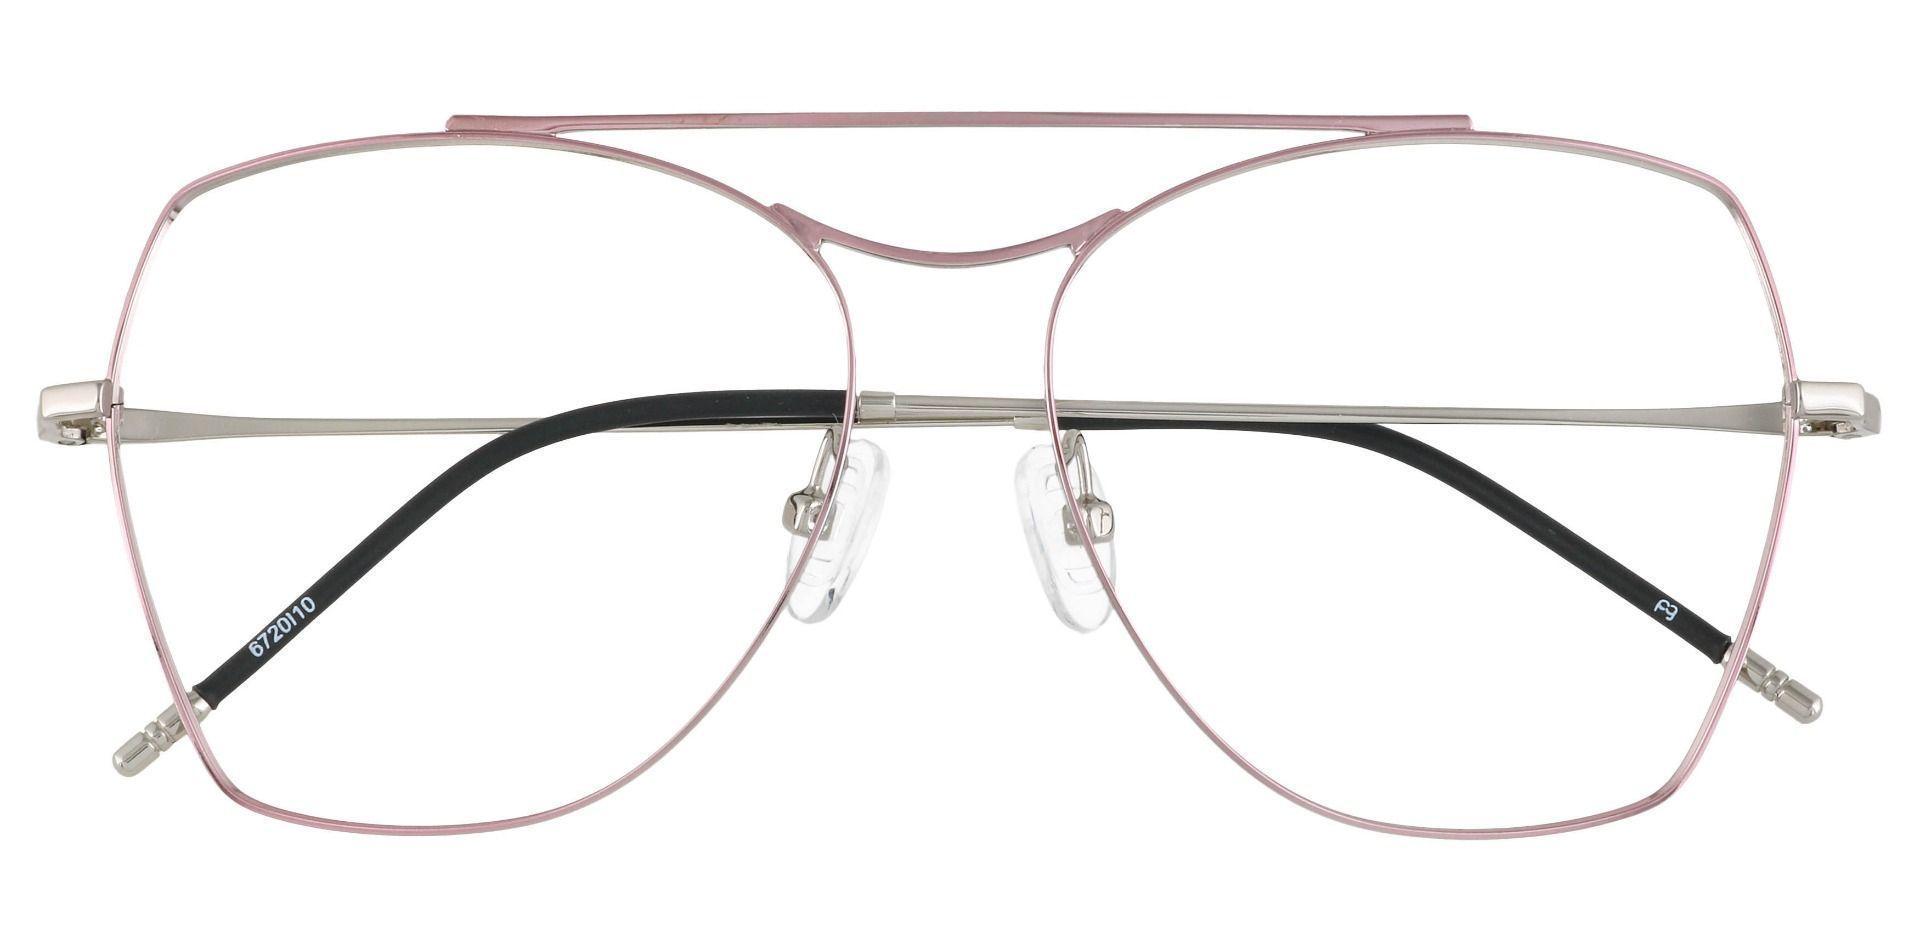 Blaine Aviator Prescription Glasses - Pink